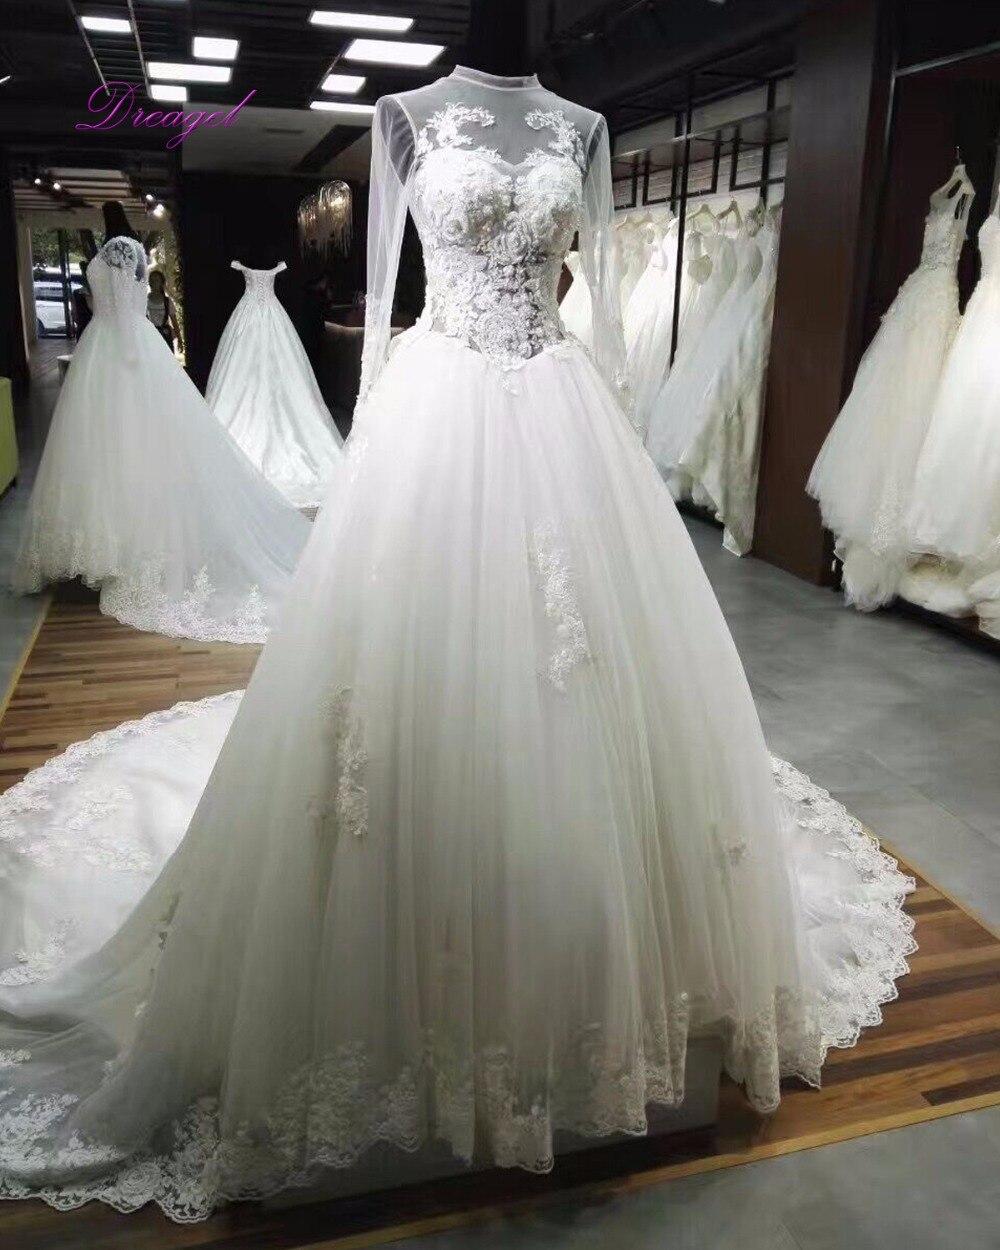 dreagel elegante de cuello alto vestido de boda de la vendimia la capilla de tren